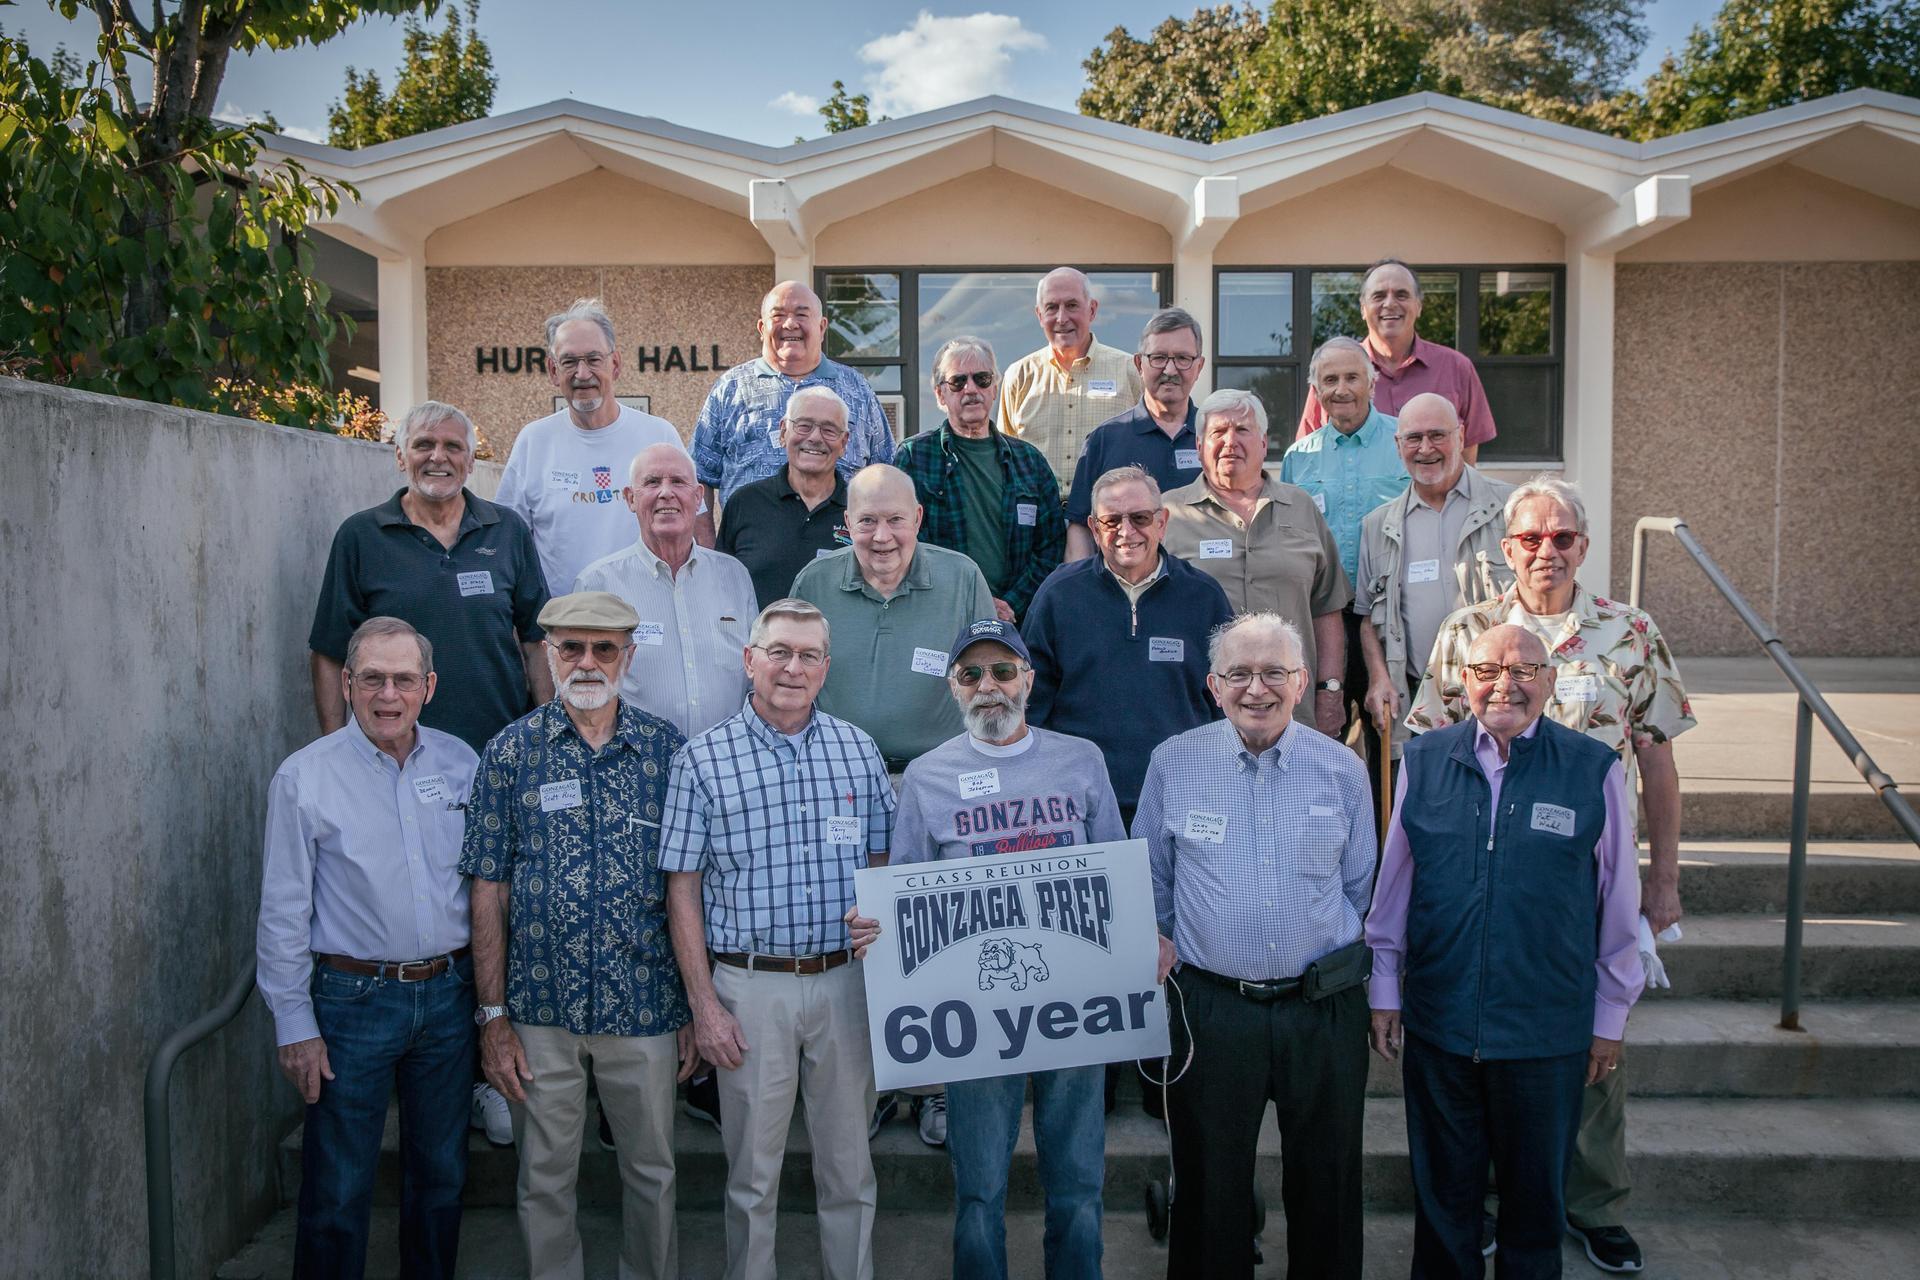 60 years